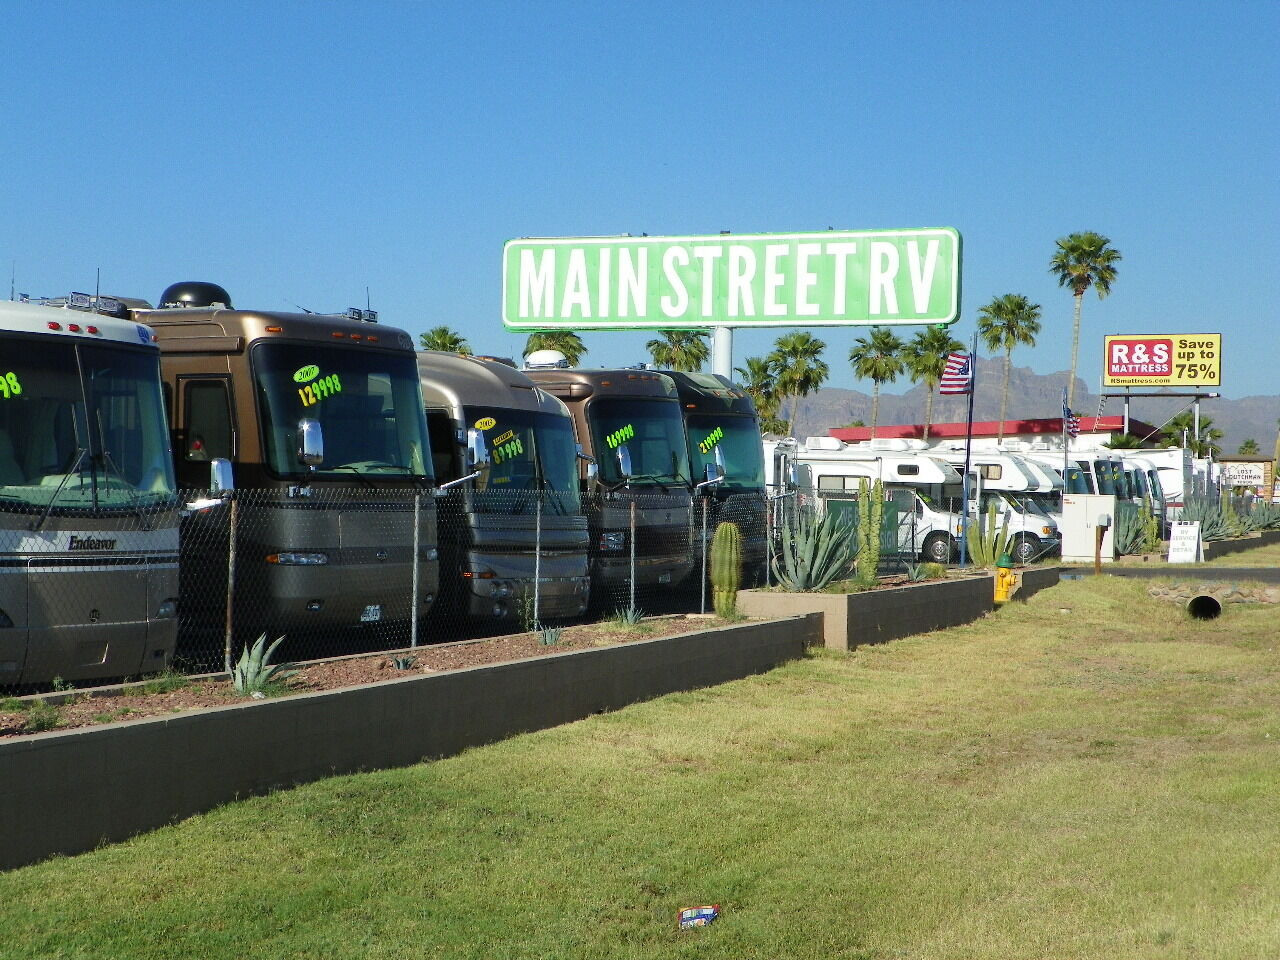 Main Street RV